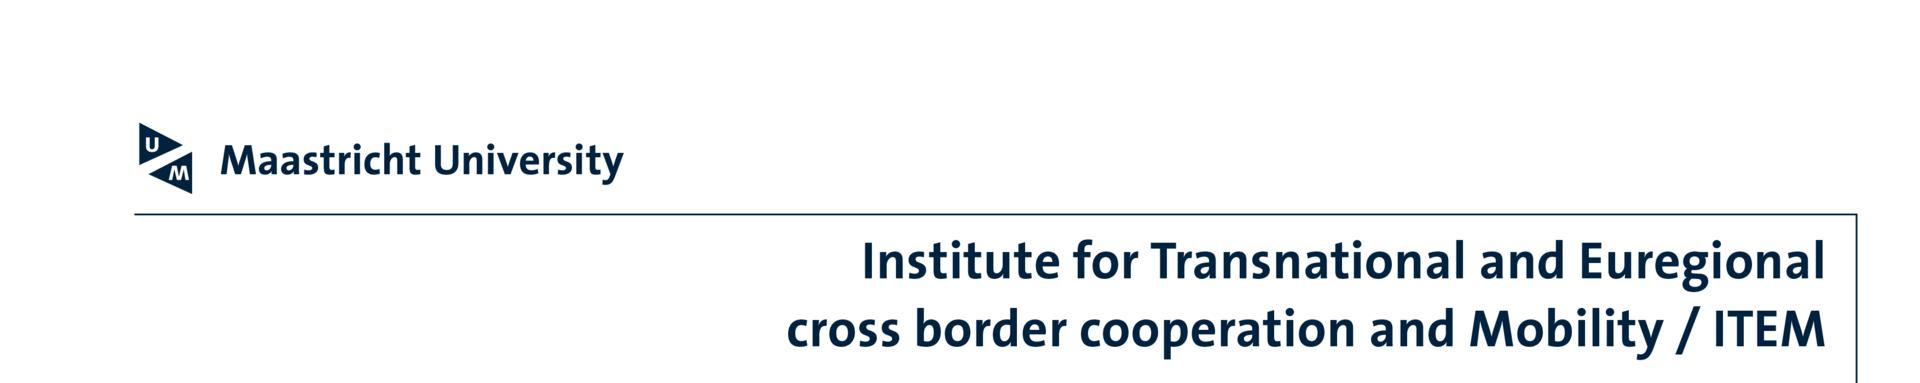 ITEM/Team GWO informatiesessie: Wet DBA en grensoverschrijdende arbeid